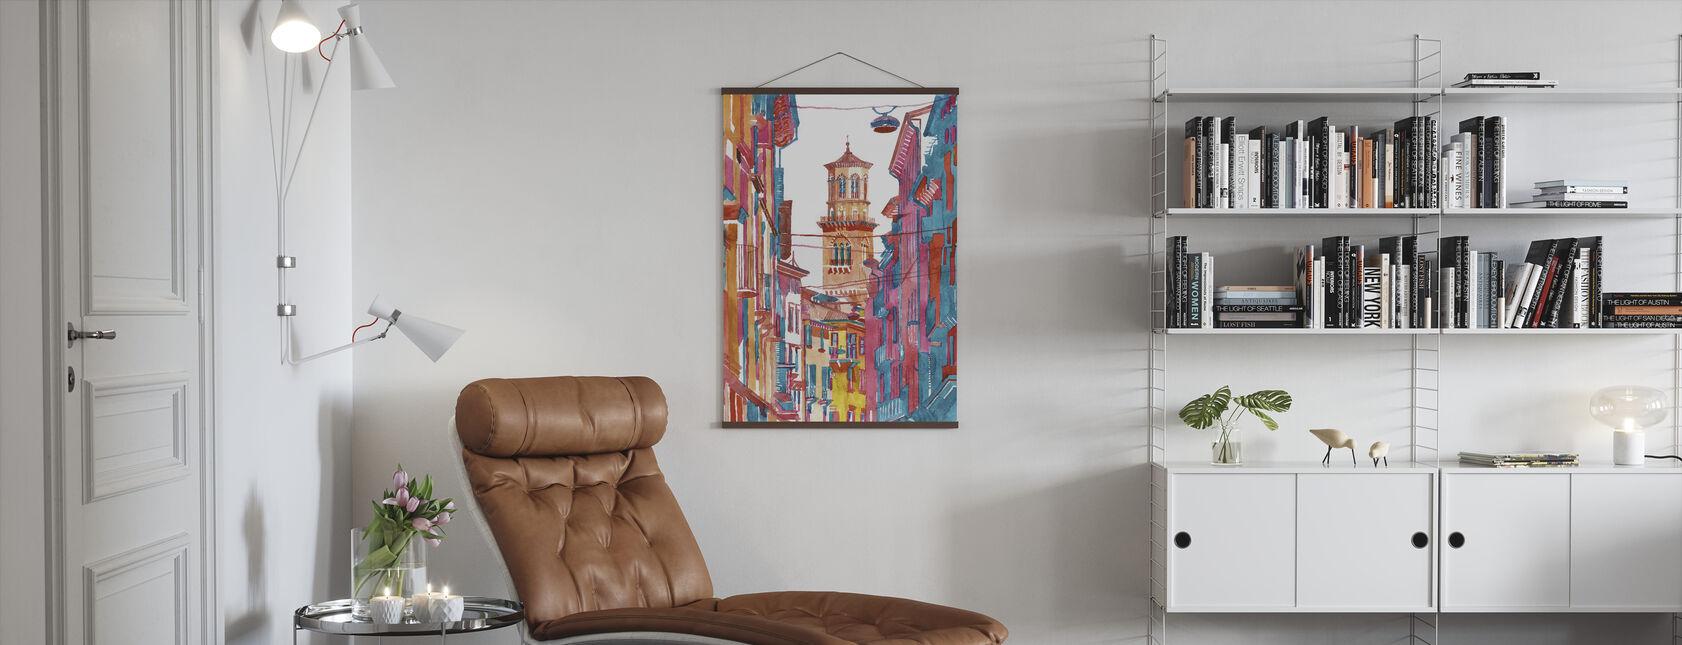 Verona Street - Poster - Living Room